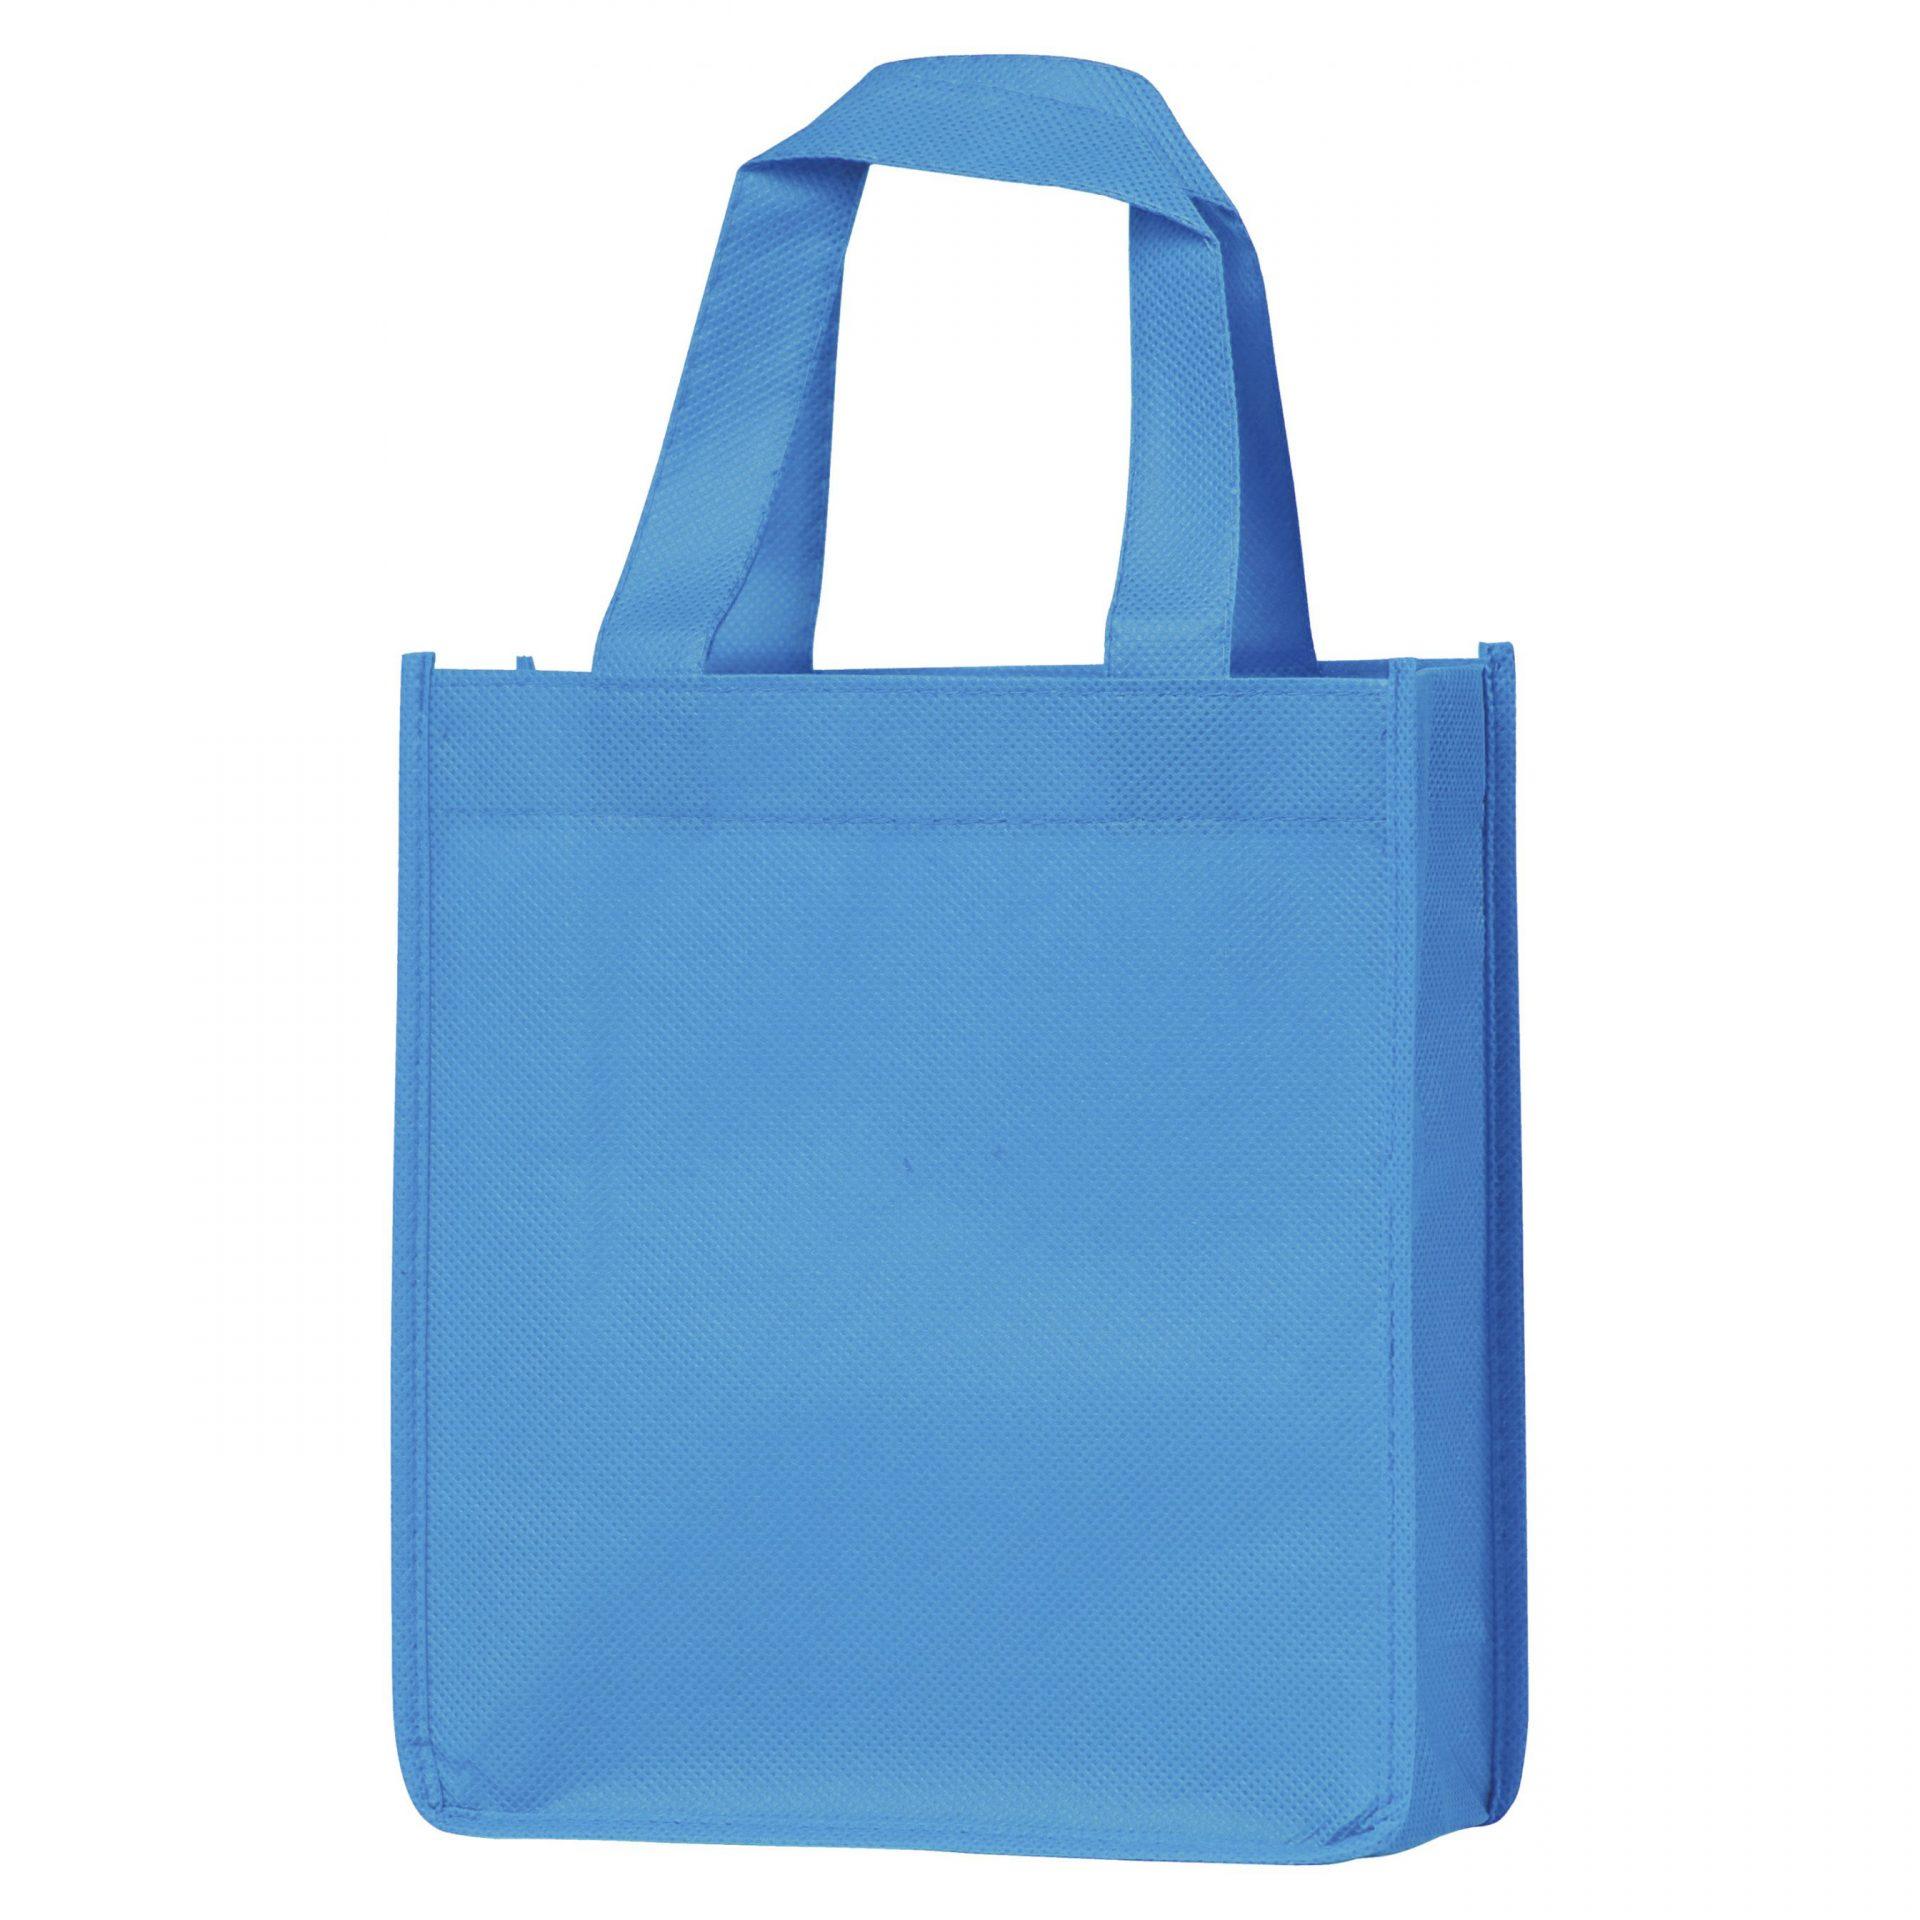 Non Woven PP Tote Bags